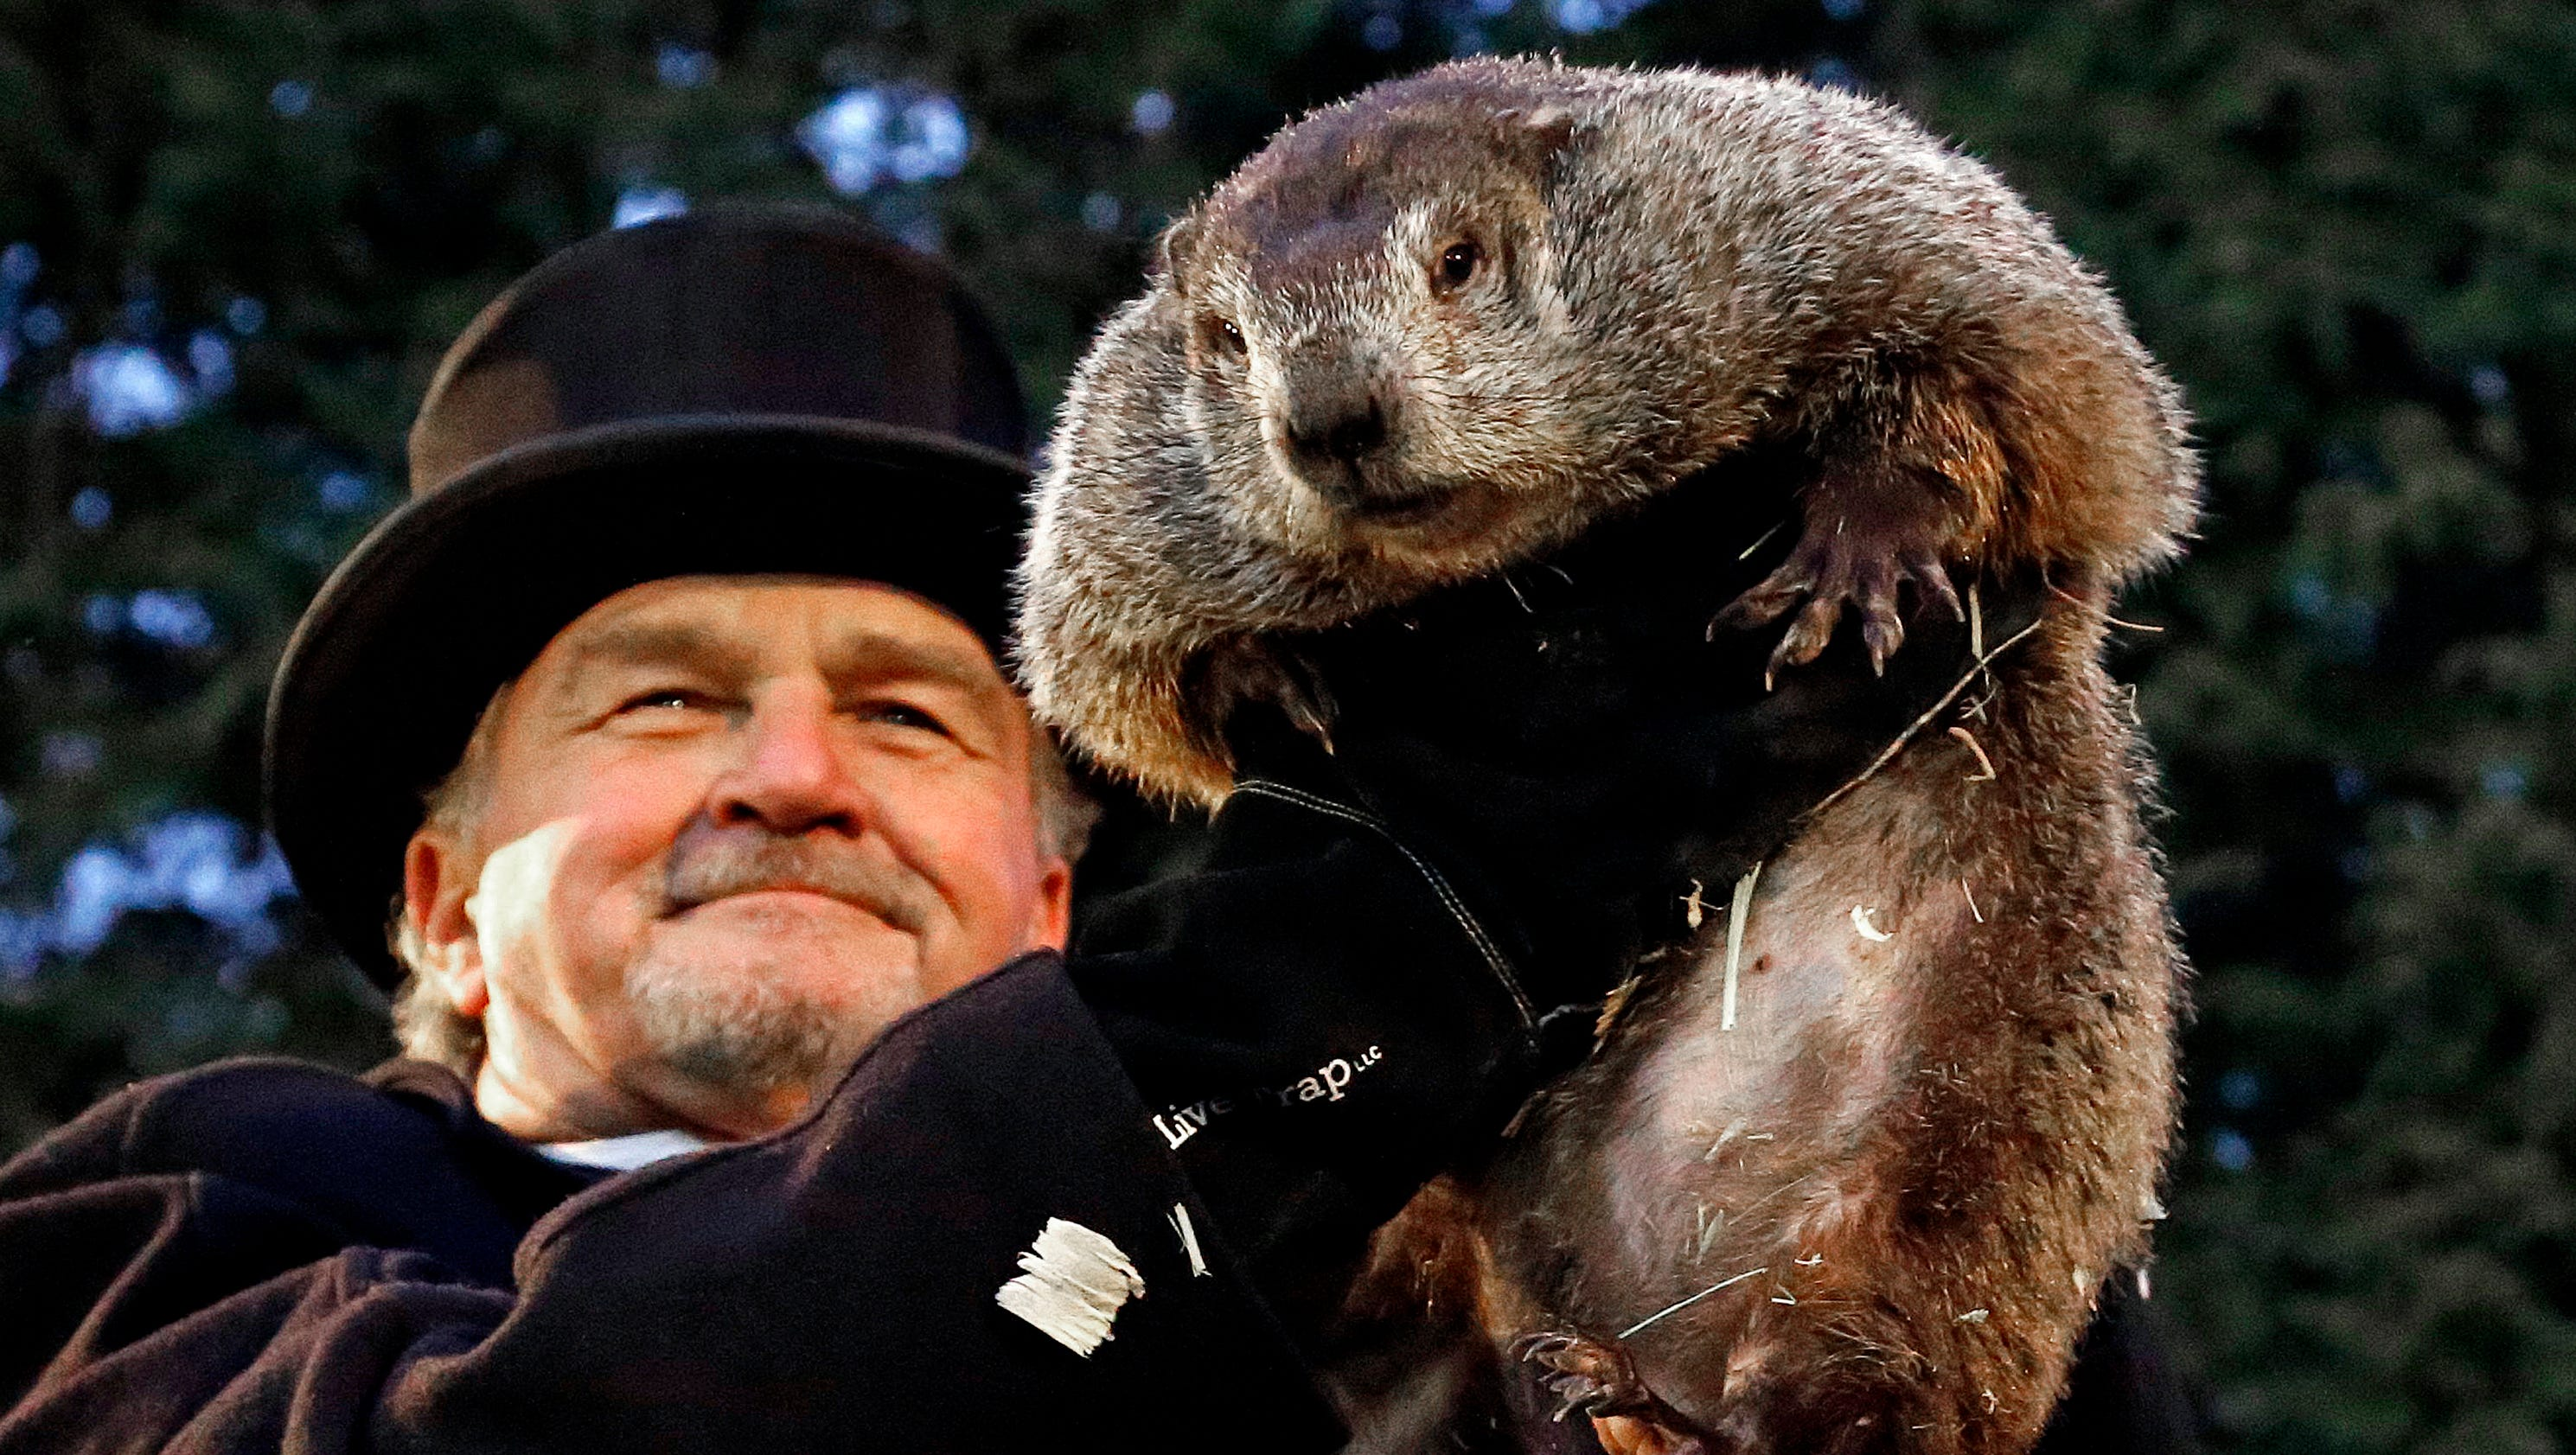 Groundhog Video Today